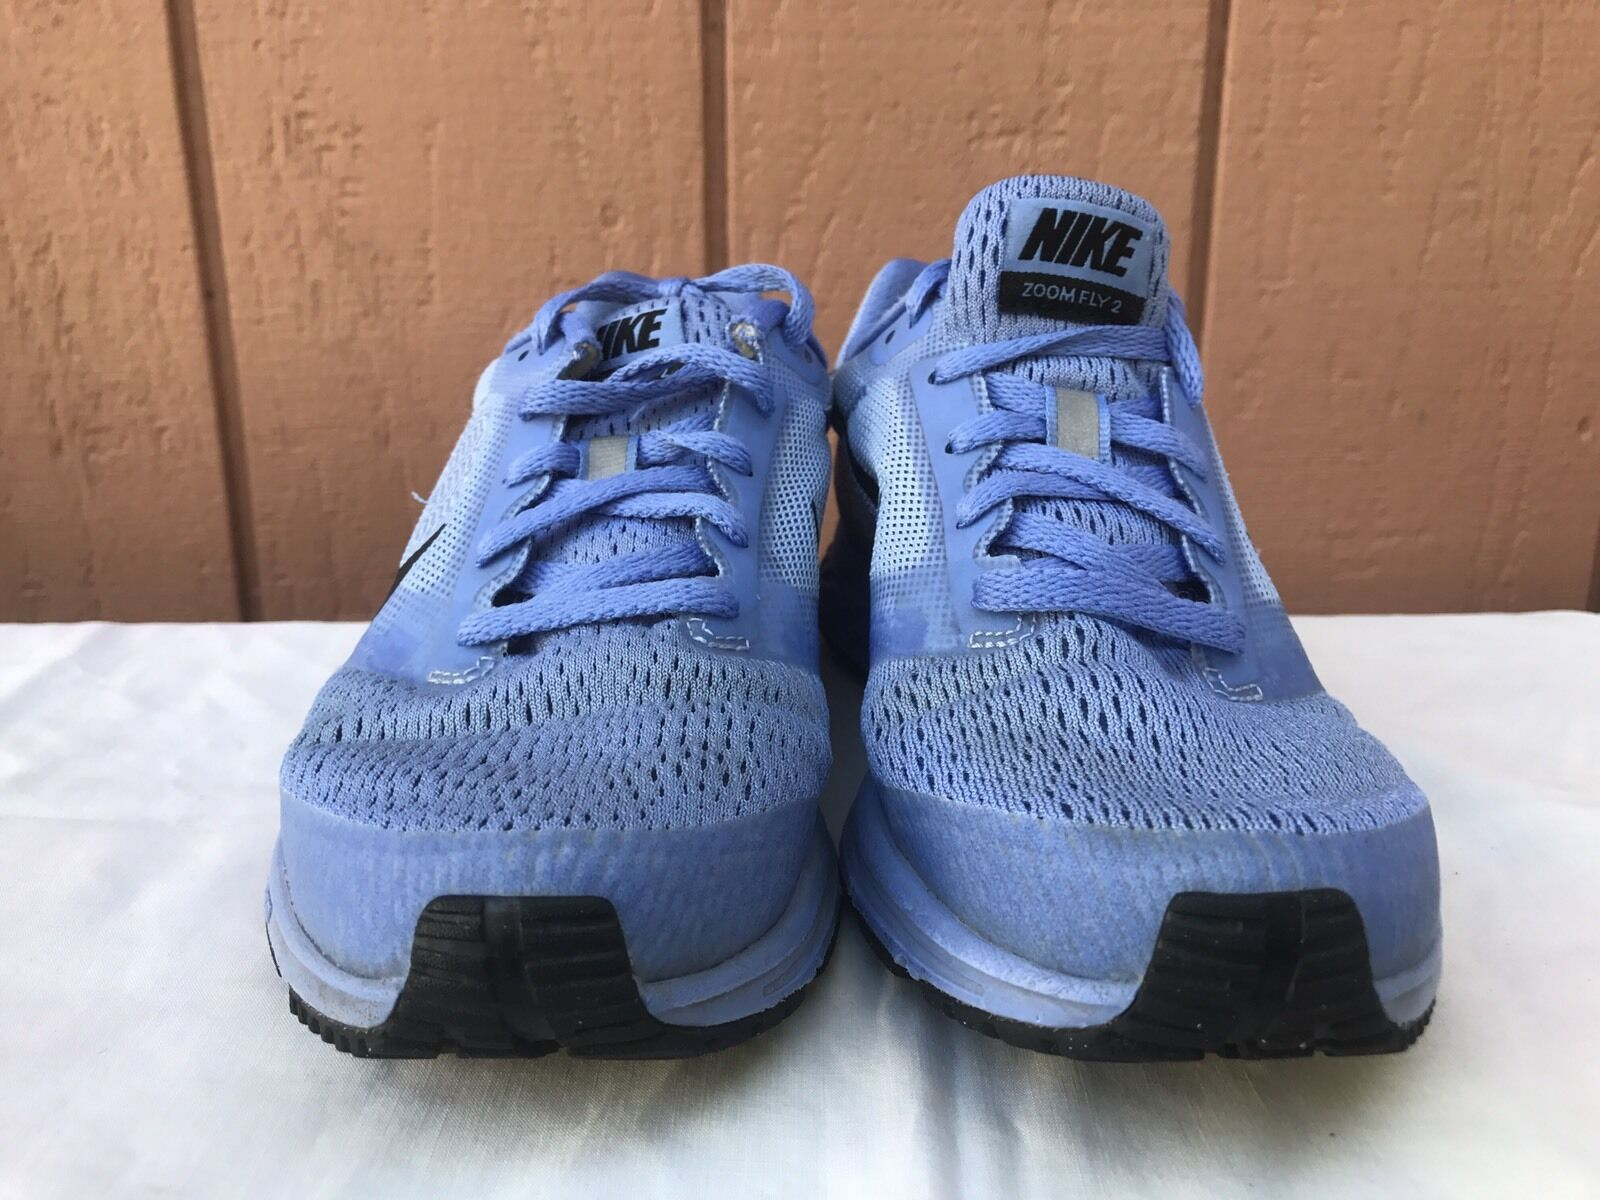 new style 9f8a8 97819 ... Nike Women s Women s Women s Air Zoom Fly 2 Chalk Blue Black Racer Blue  Running ...